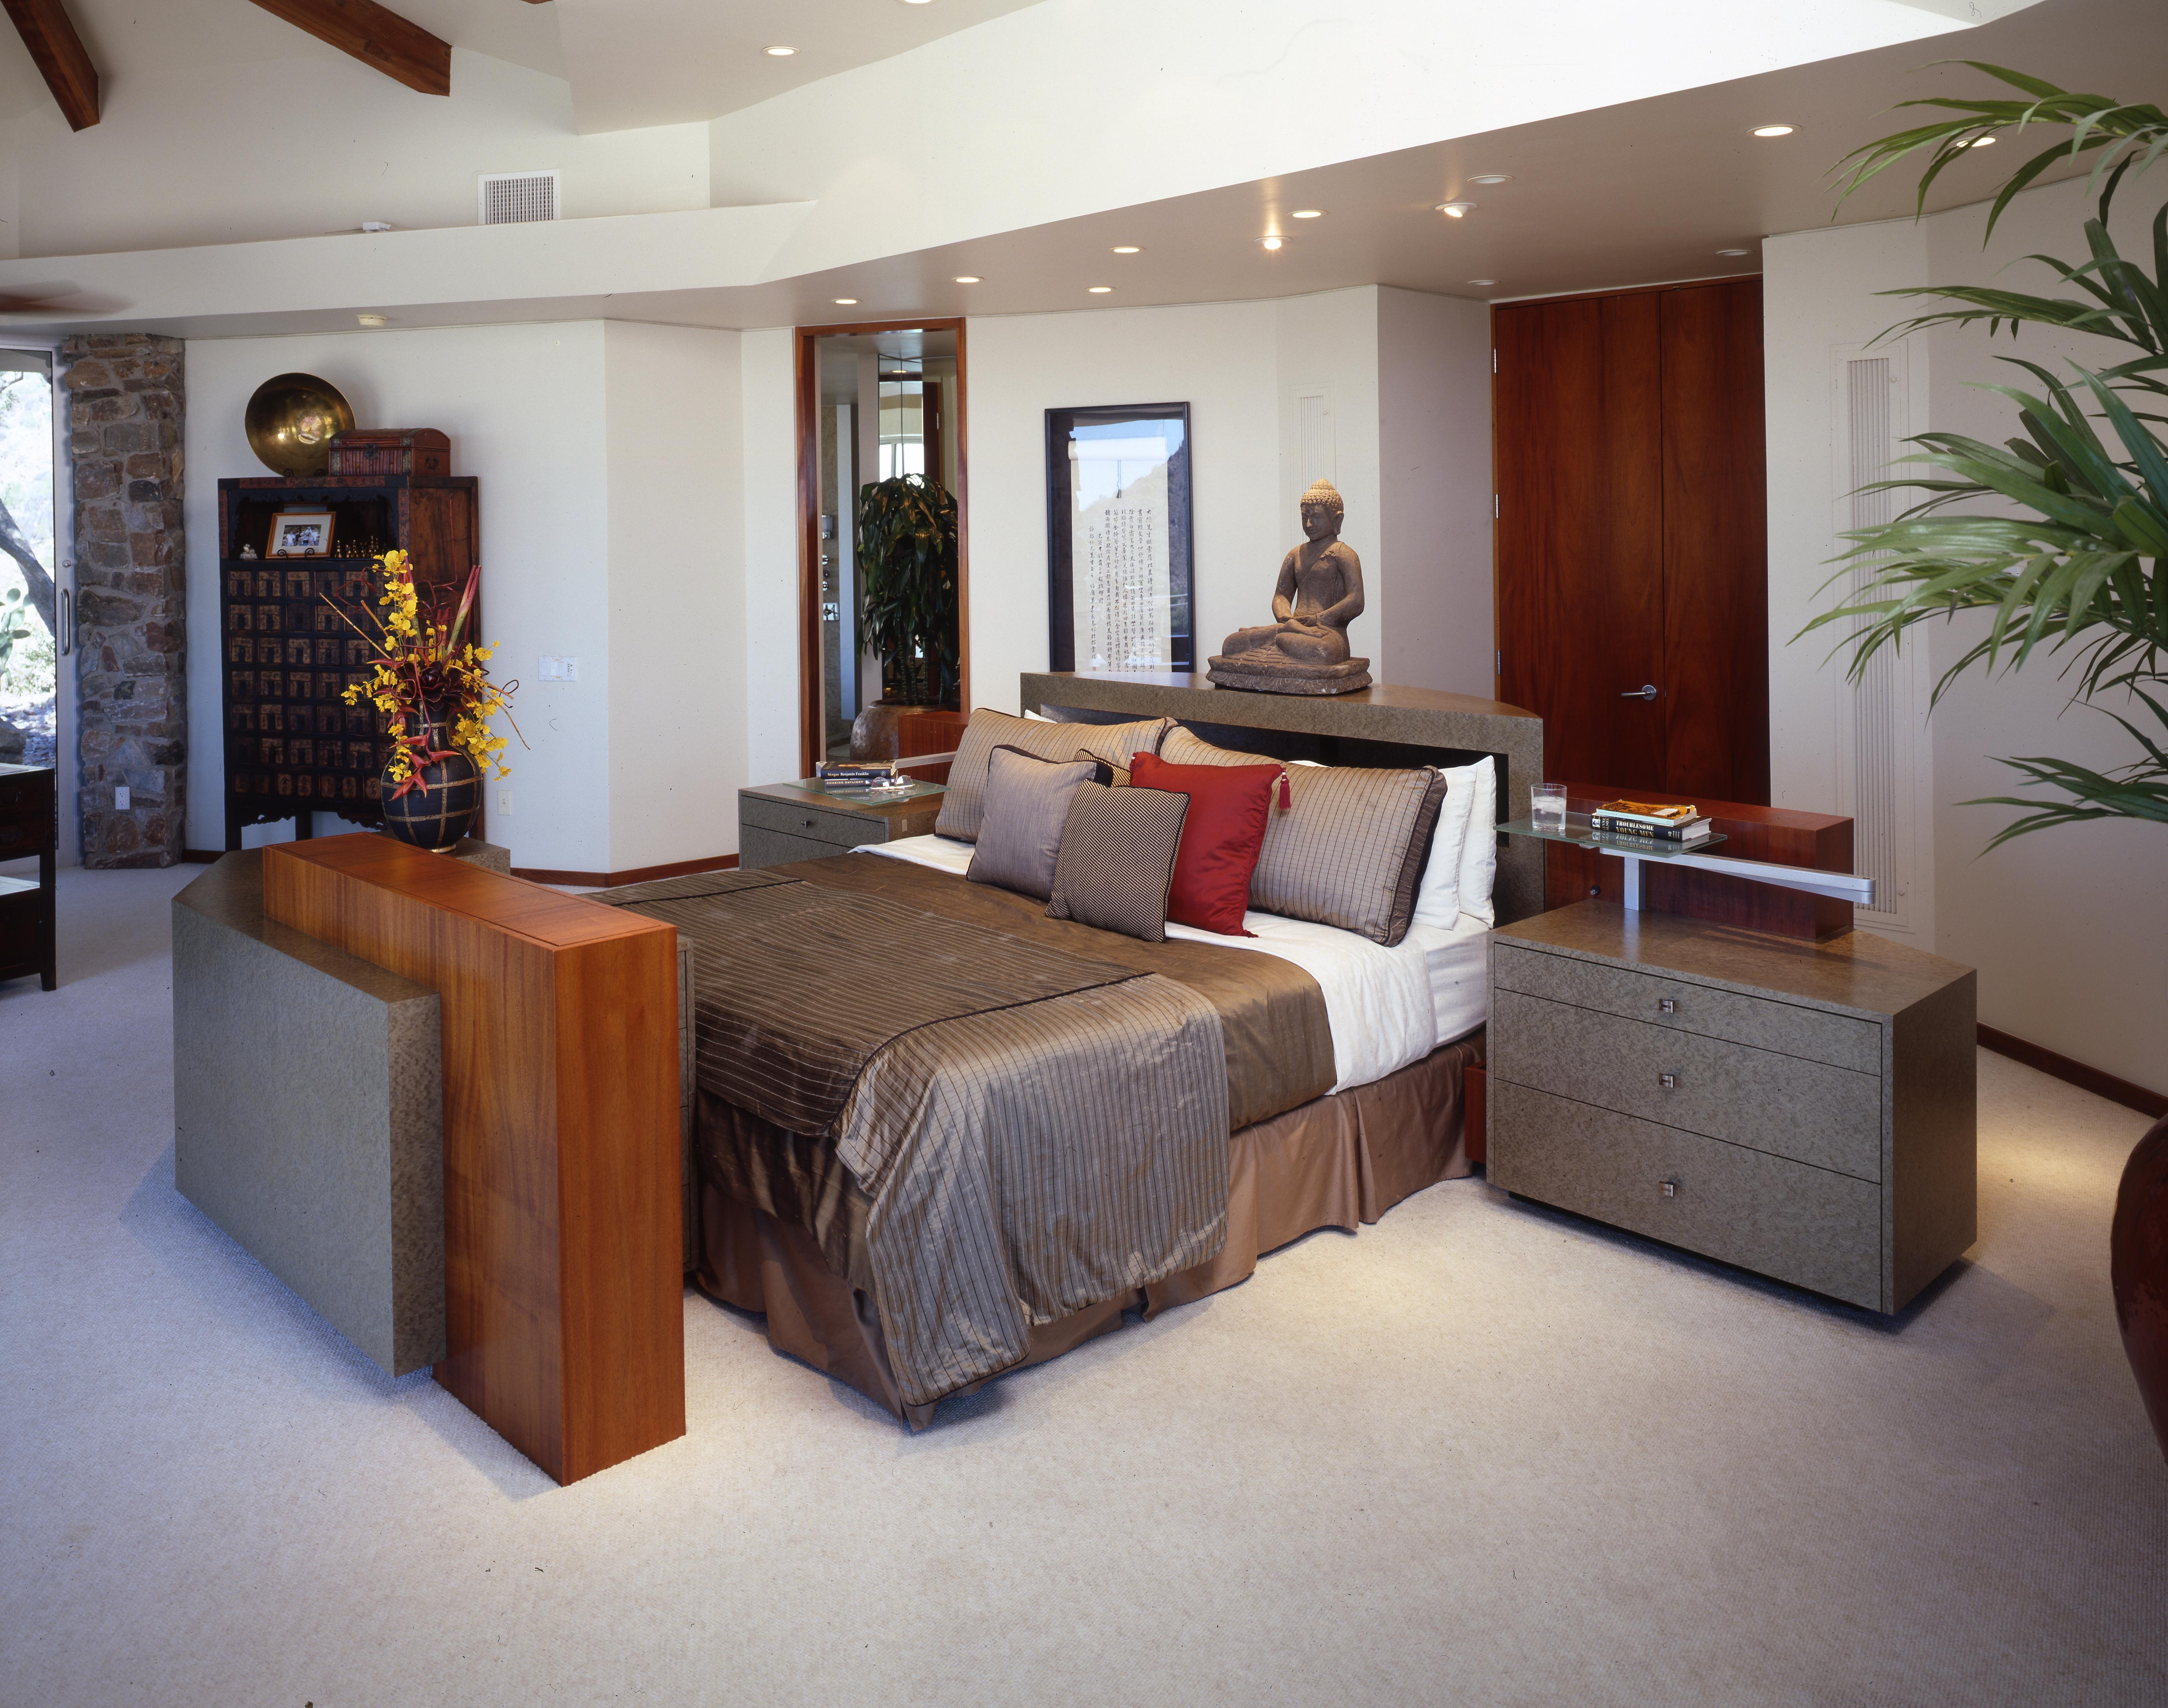 contemporary bed, inca, plasma lift, tv lift for cabinets, custom nightstands, custom bed, tv lift, tv stand, custom tv lift for cabinet, custom tv lift